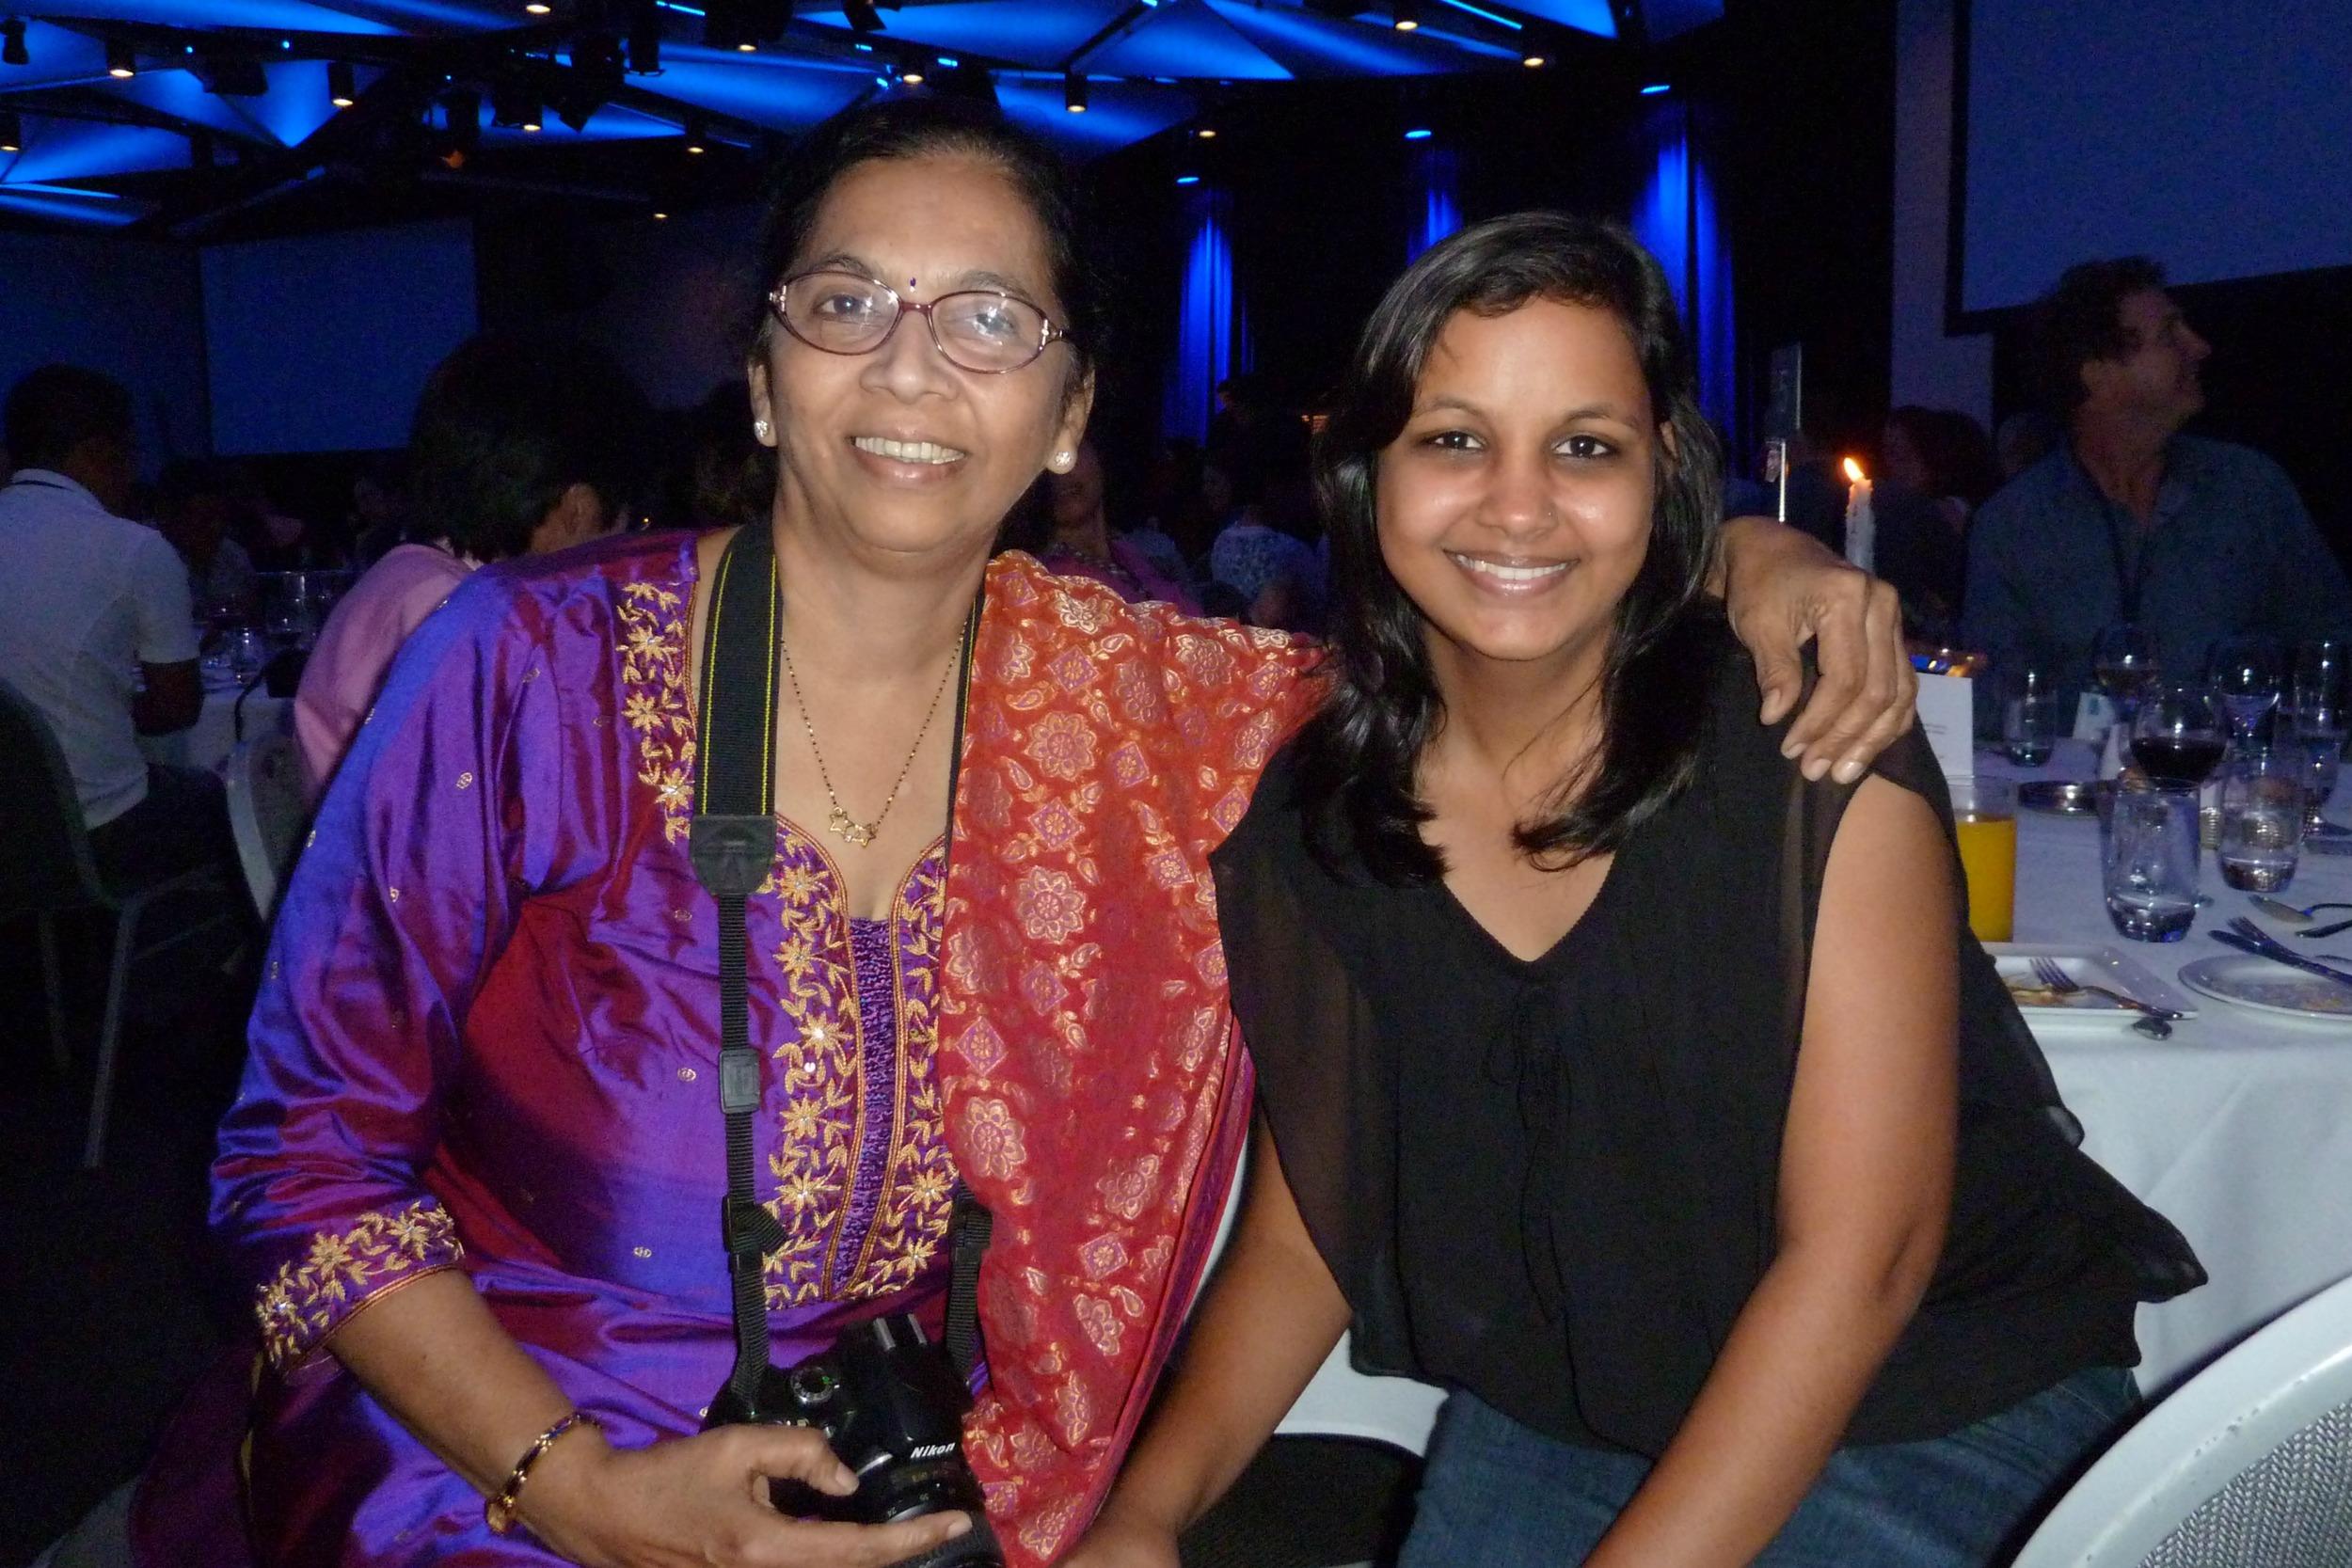 P1050234 Madhavi Indap and student Sweta Agrawal.jpg